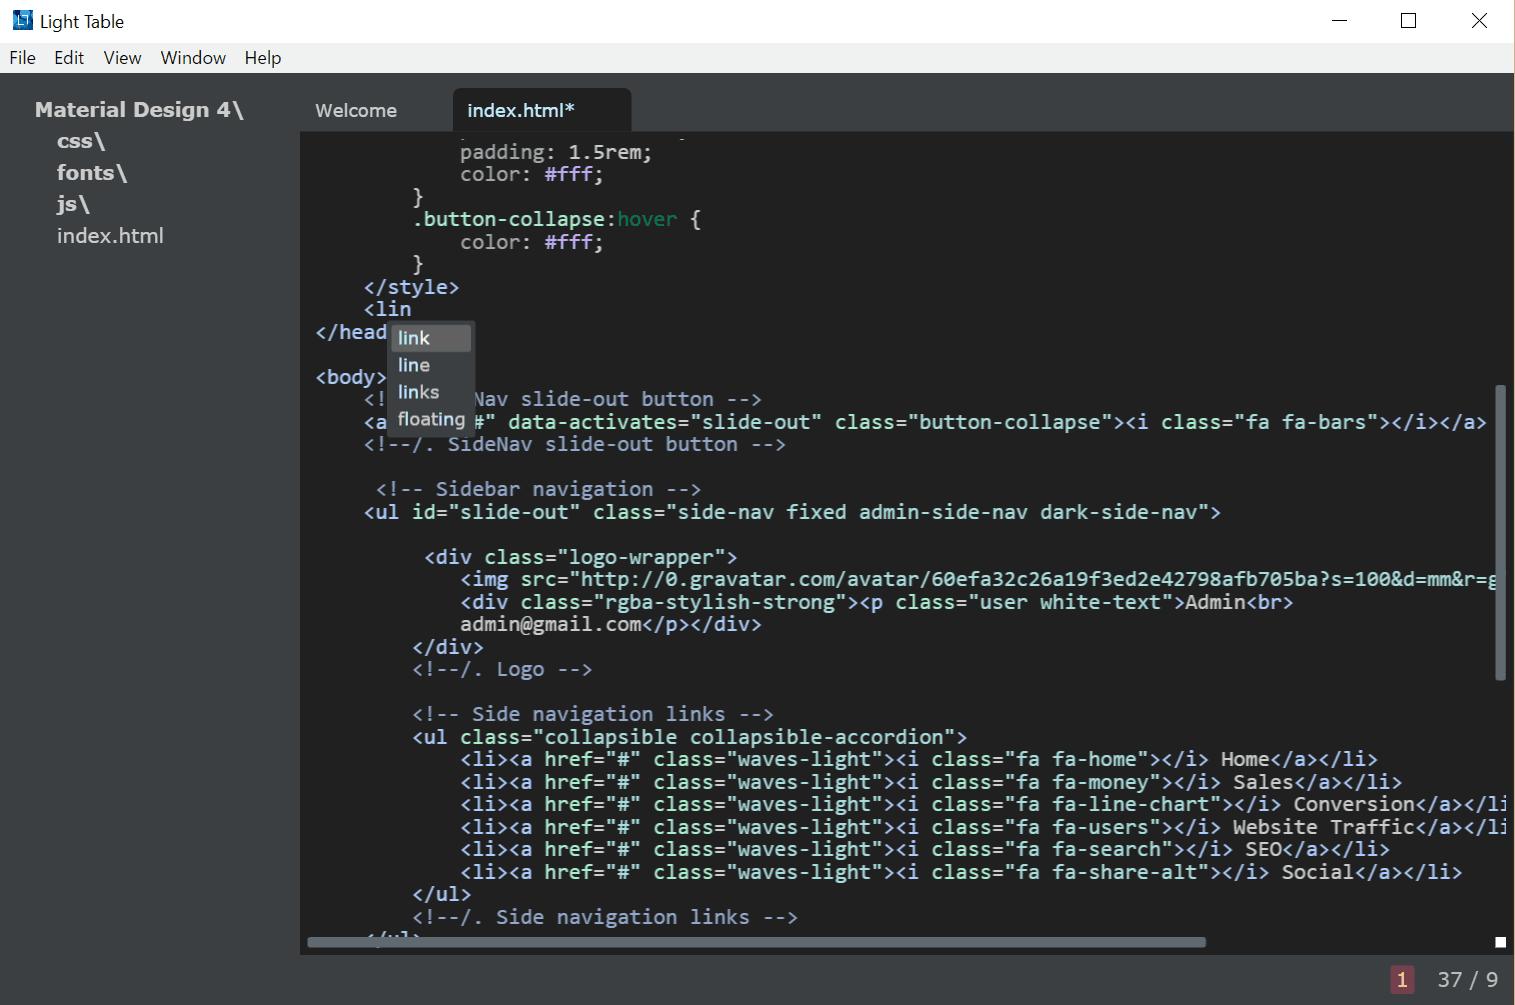 Light table code editor